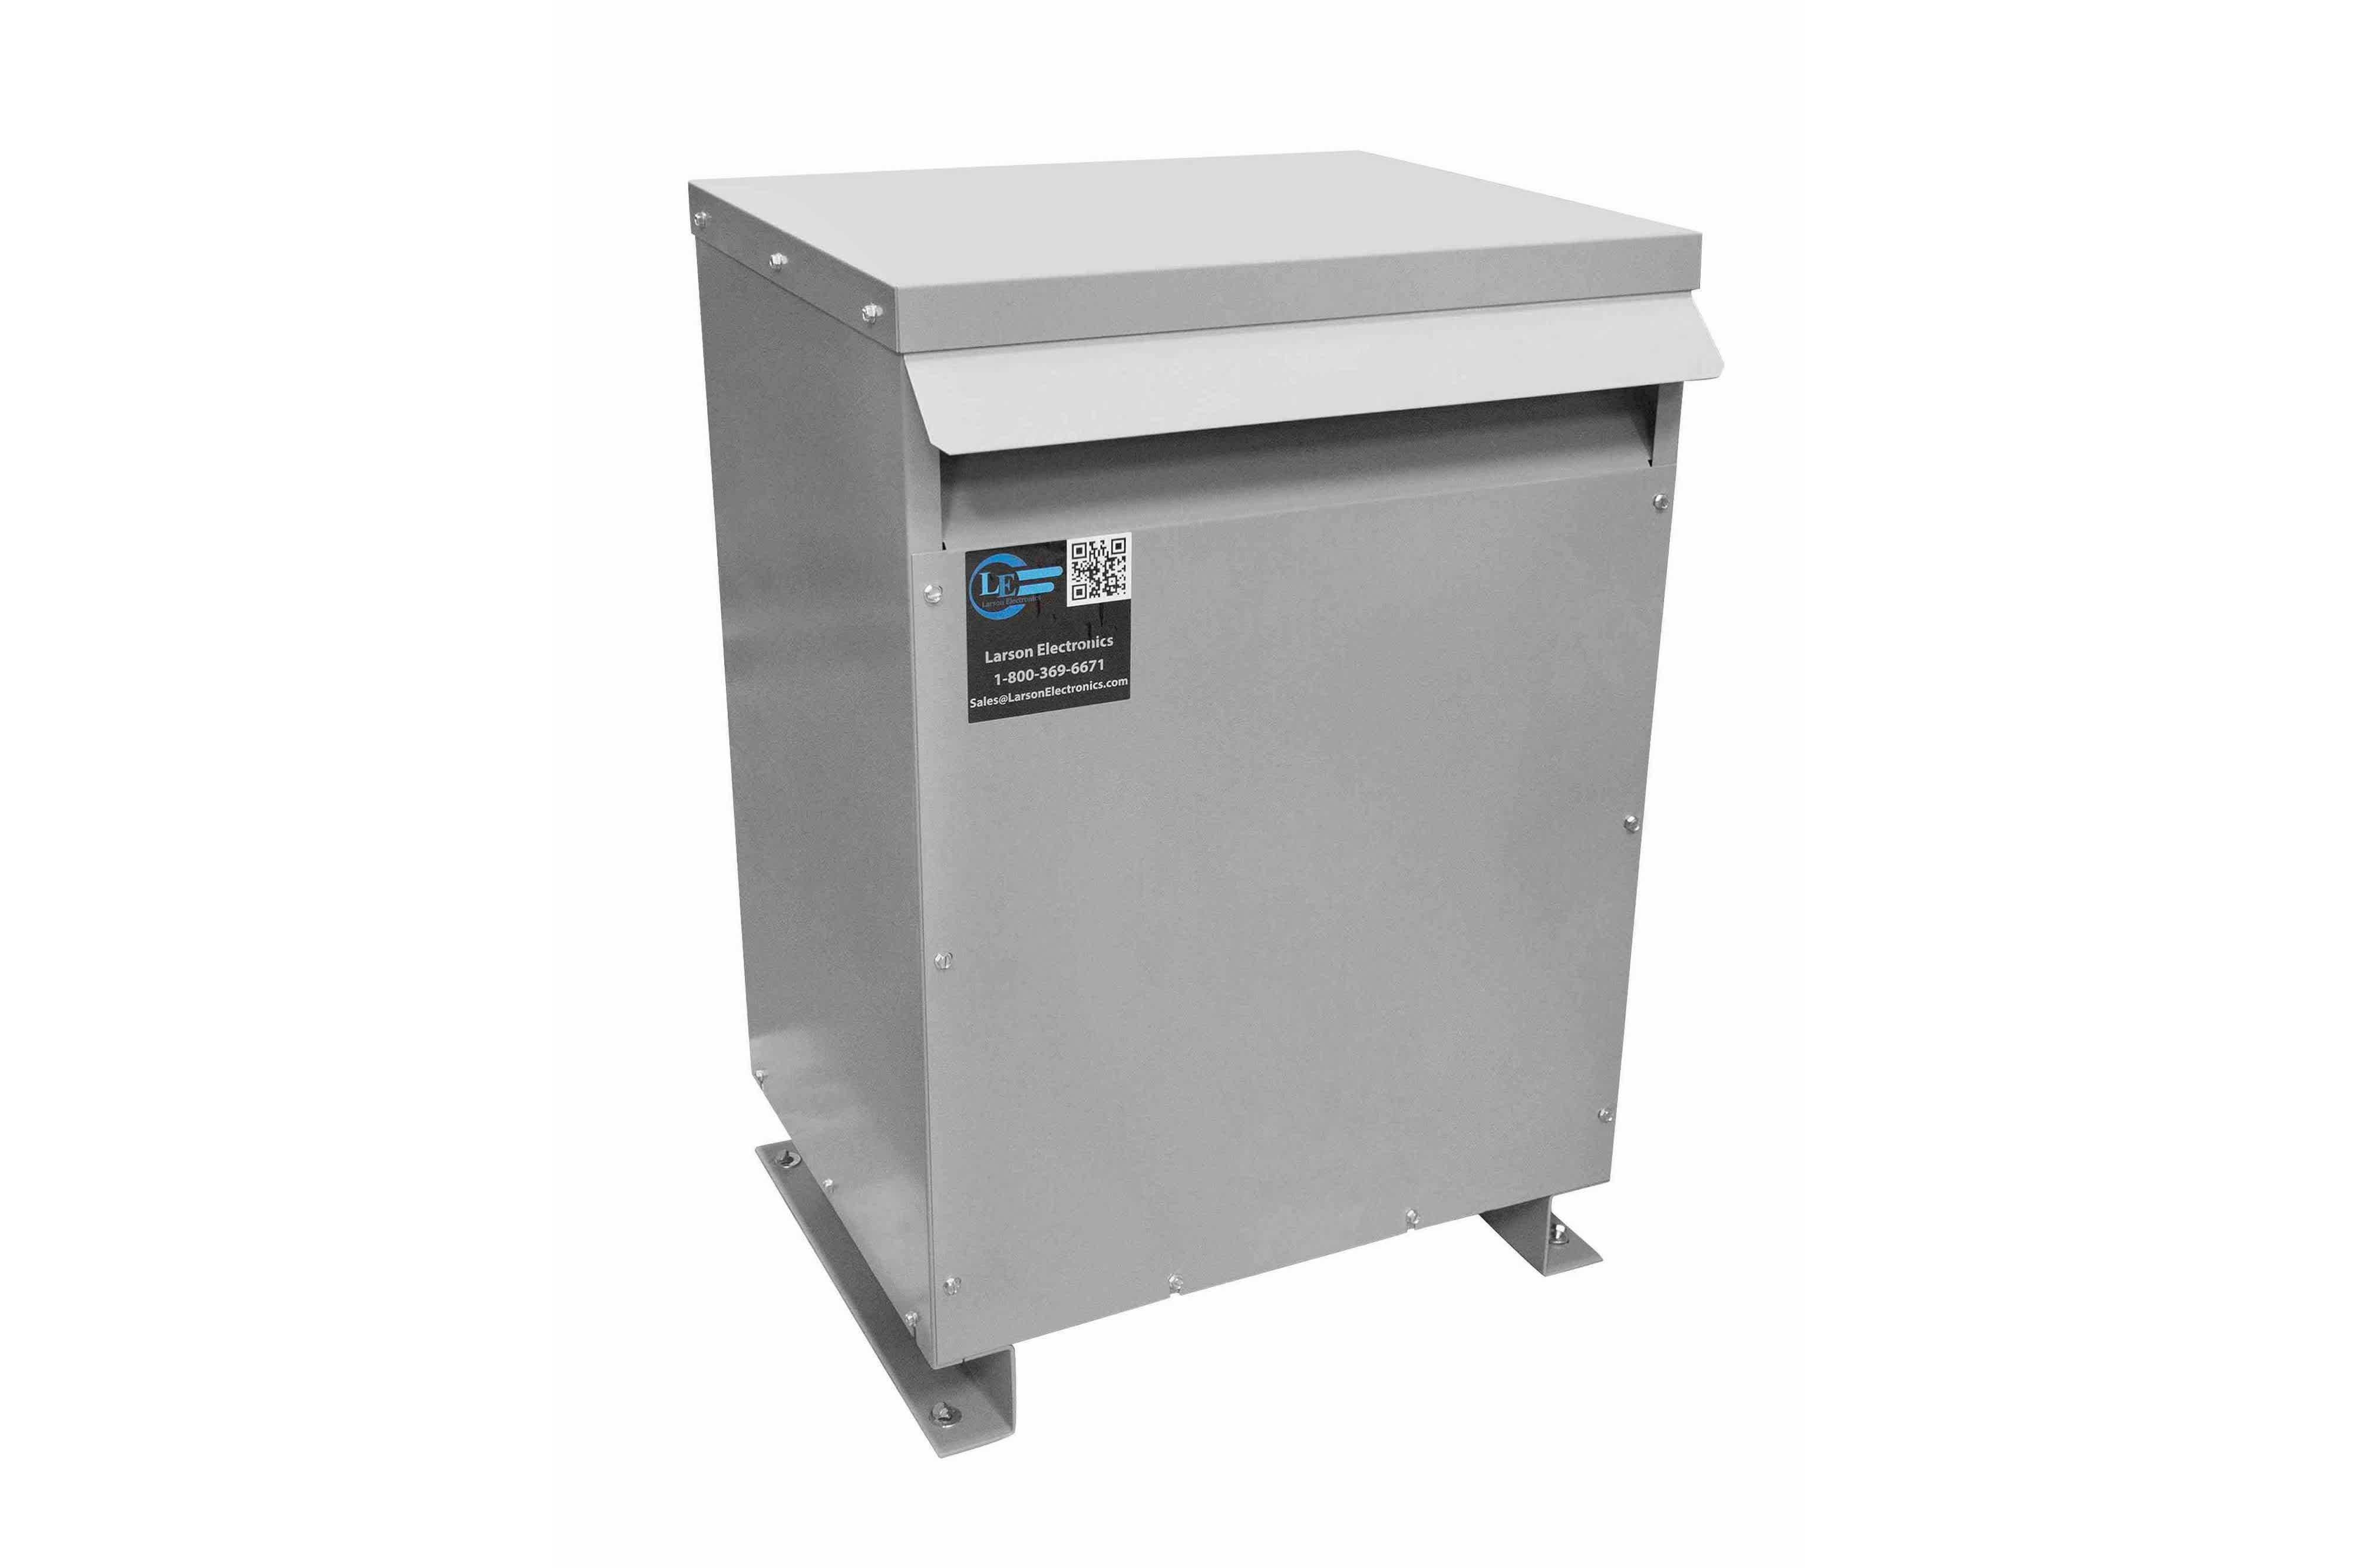 500 kVA 3PH Isolation Transformer, 600V Wye Primary, 460Y/266 Wye-N Secondary, N3R, Ventilated, 60 Hz